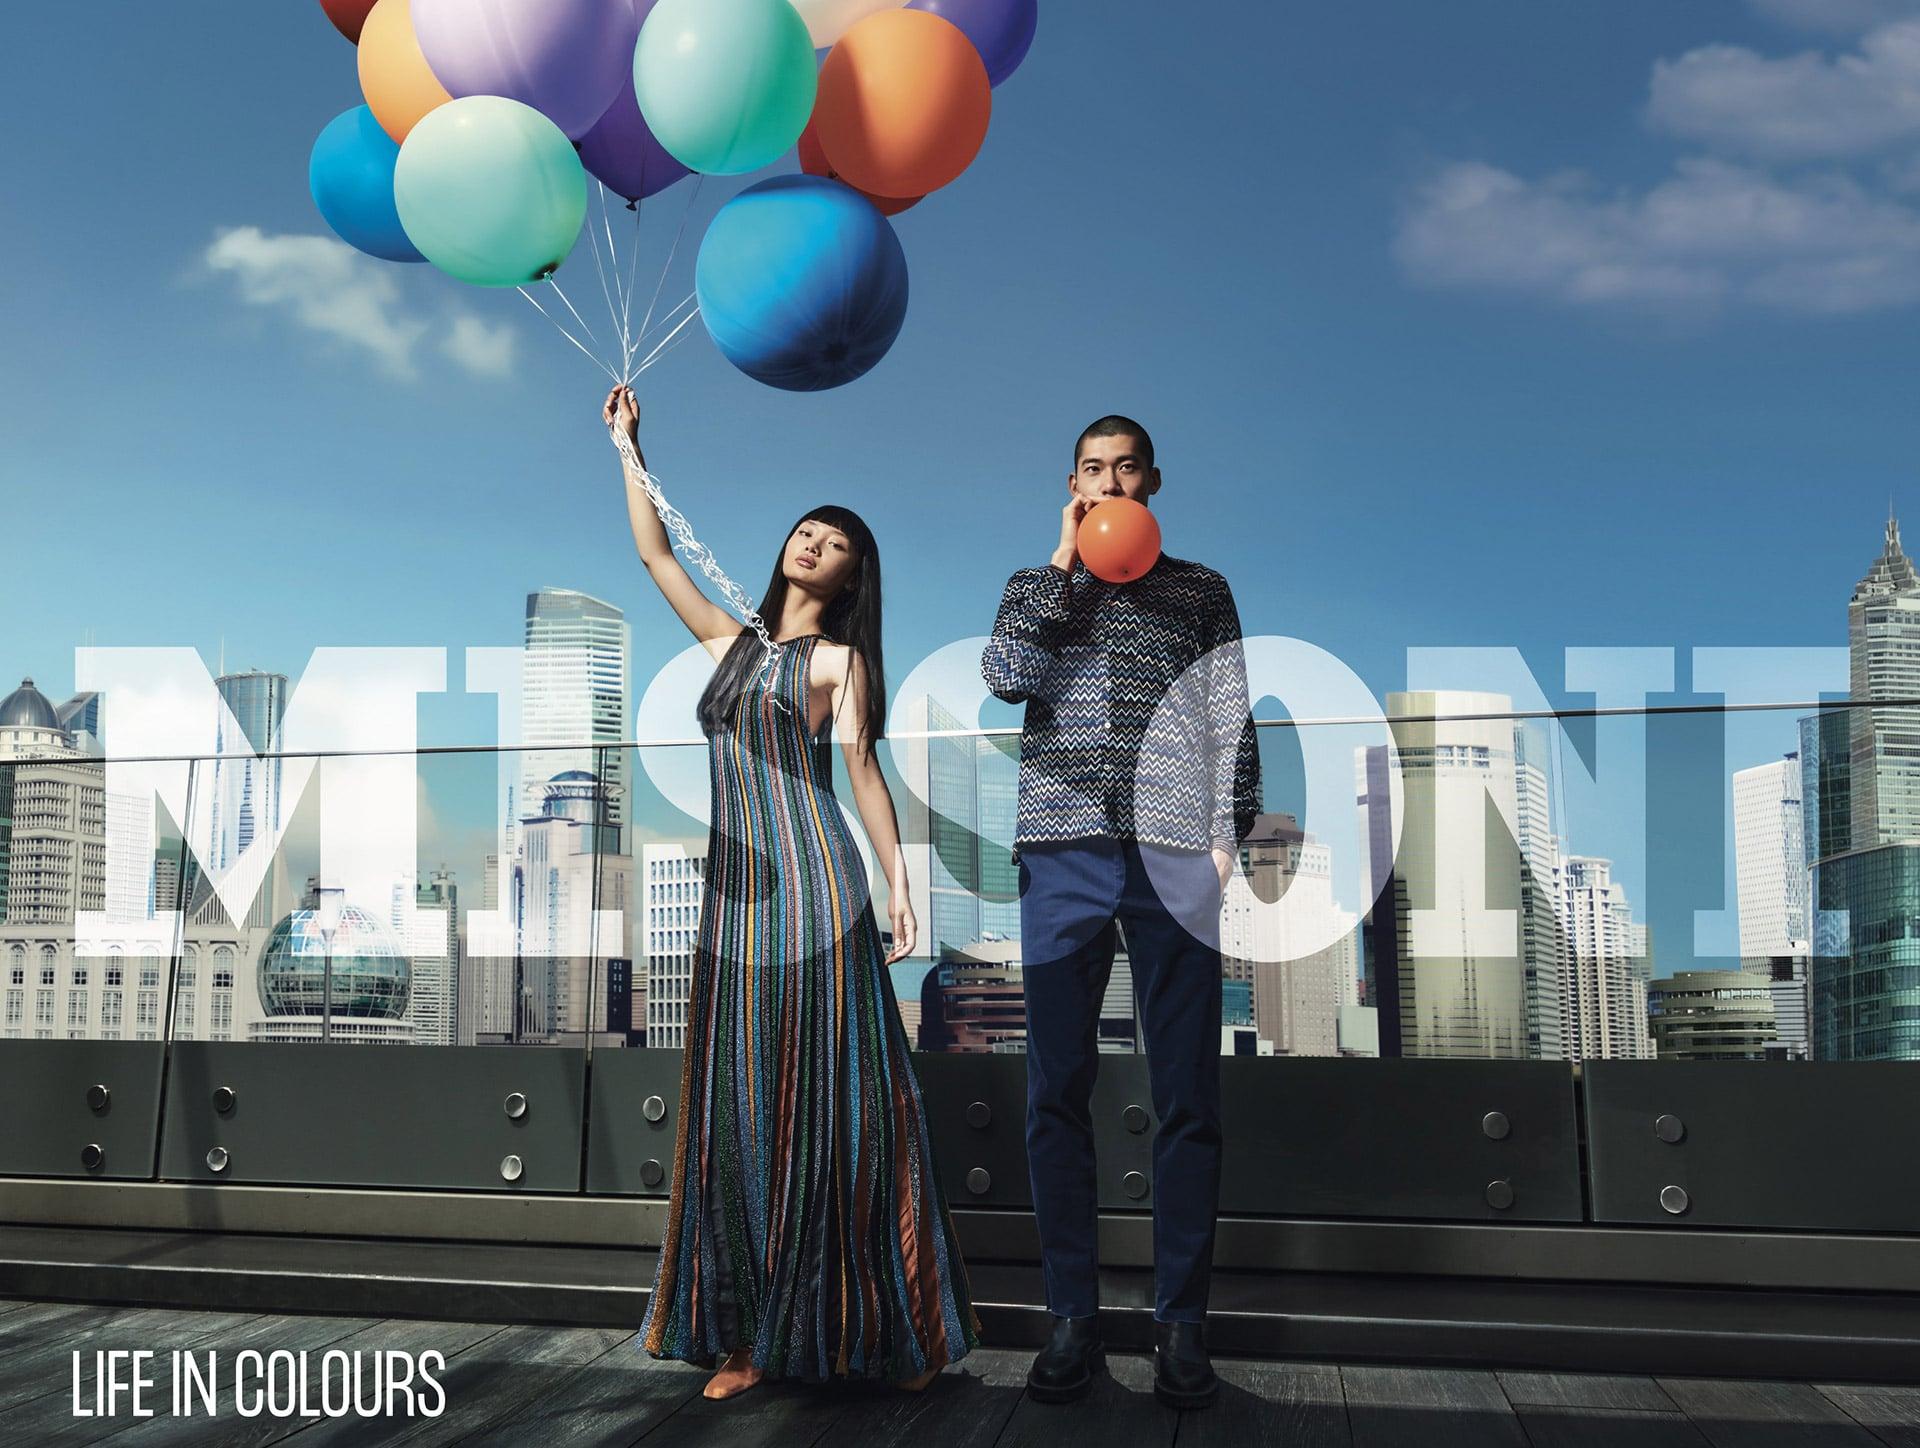 MISSONI balloons